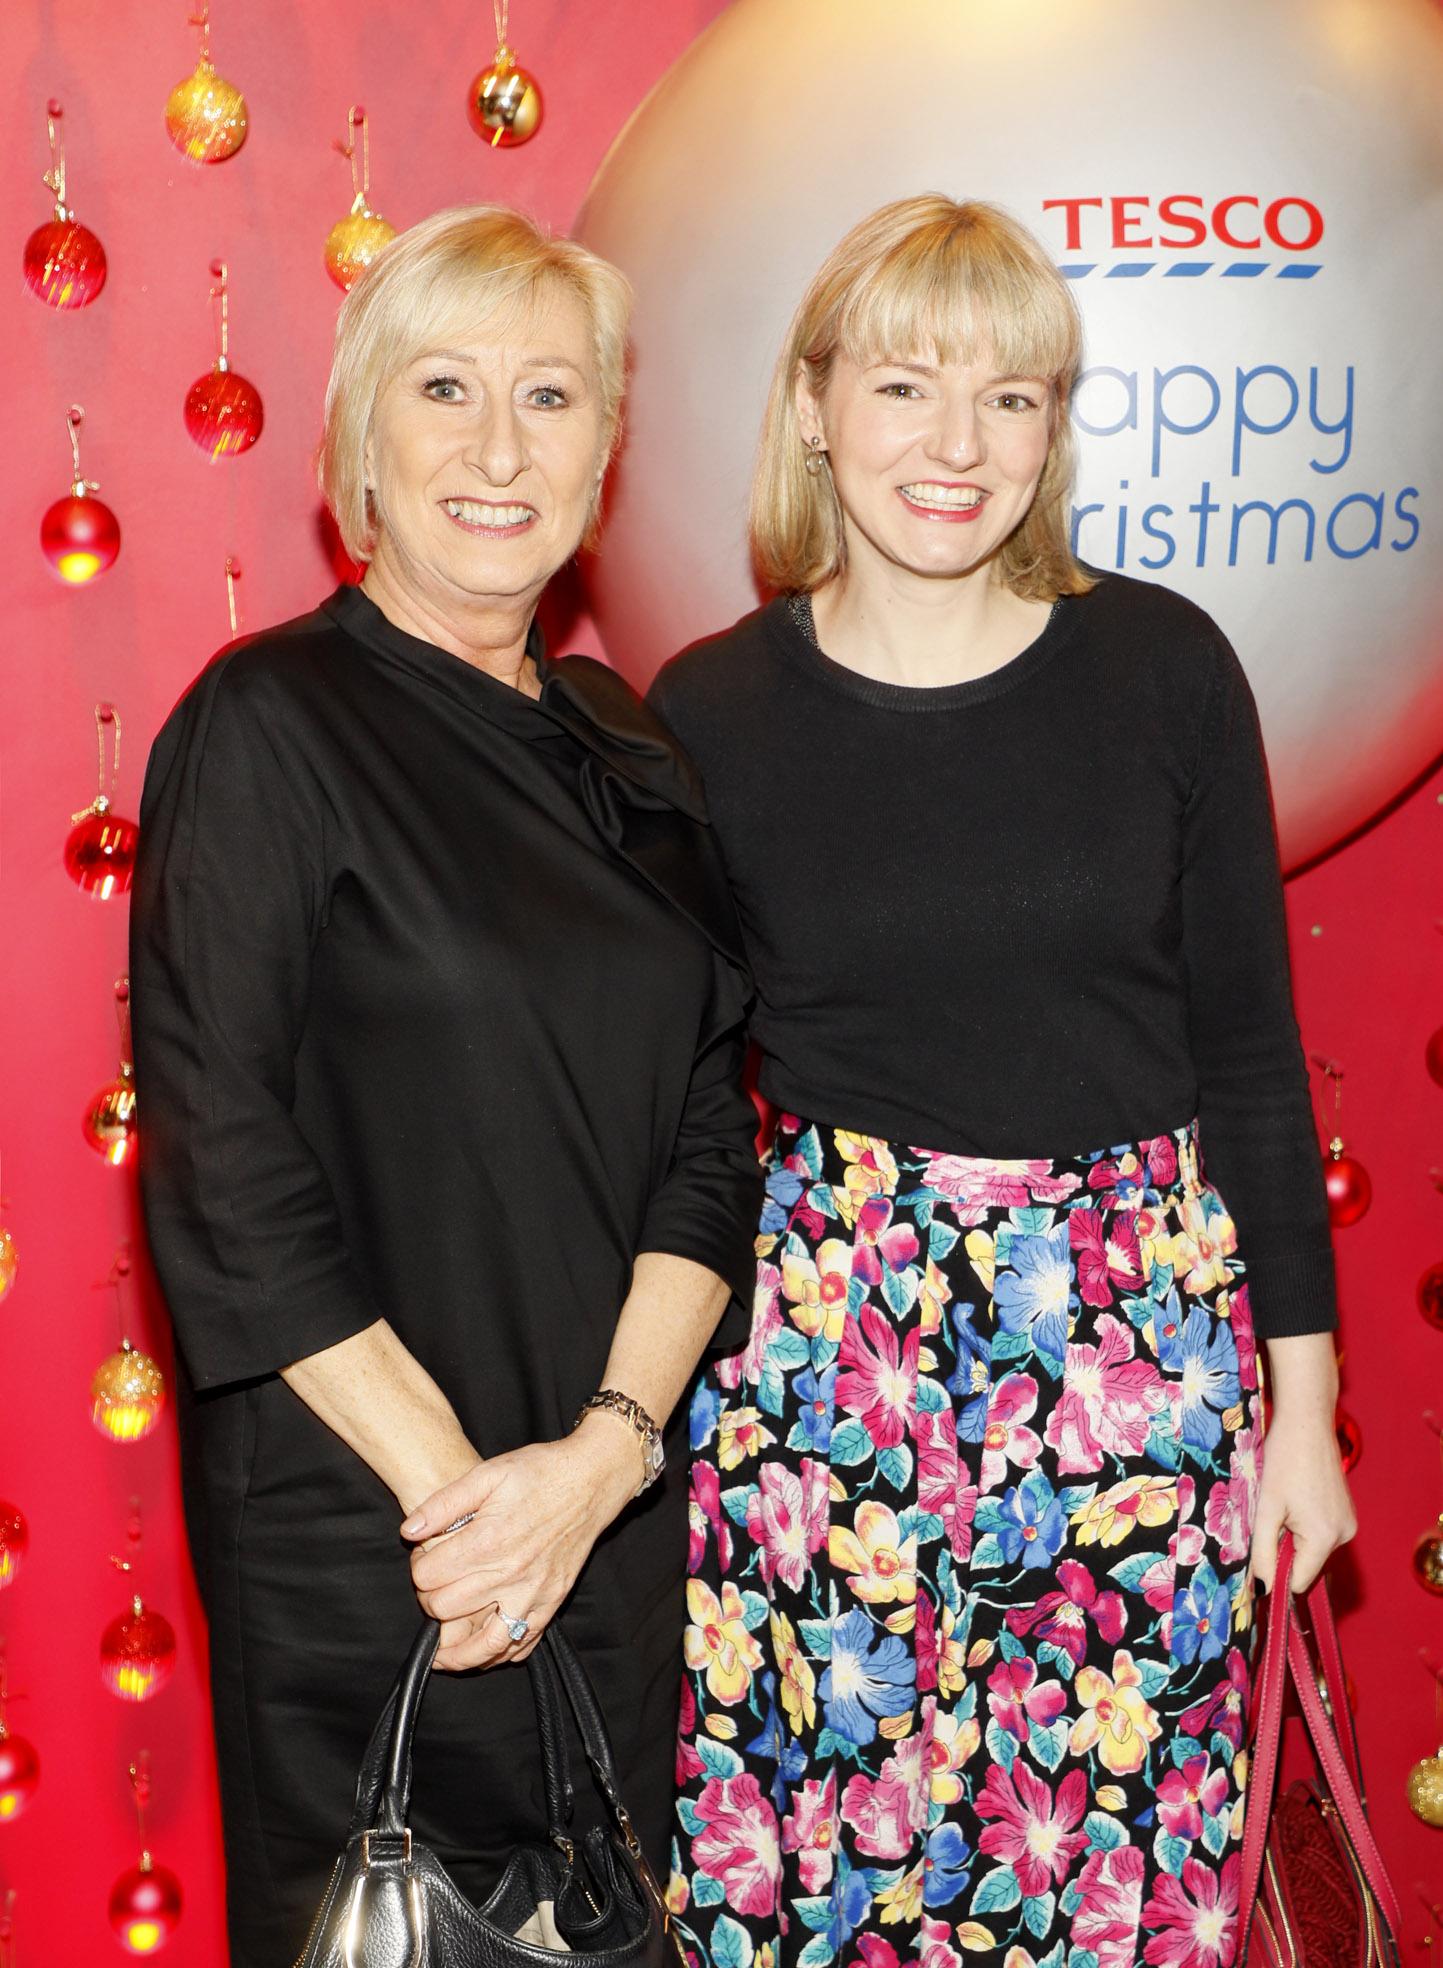 Regina Hinds and Emily Elphinstone at the Tesco 2019 Christmas Showcase in Dublin's Iveagh Garden Hotel.   Photo: Kieran Harnett